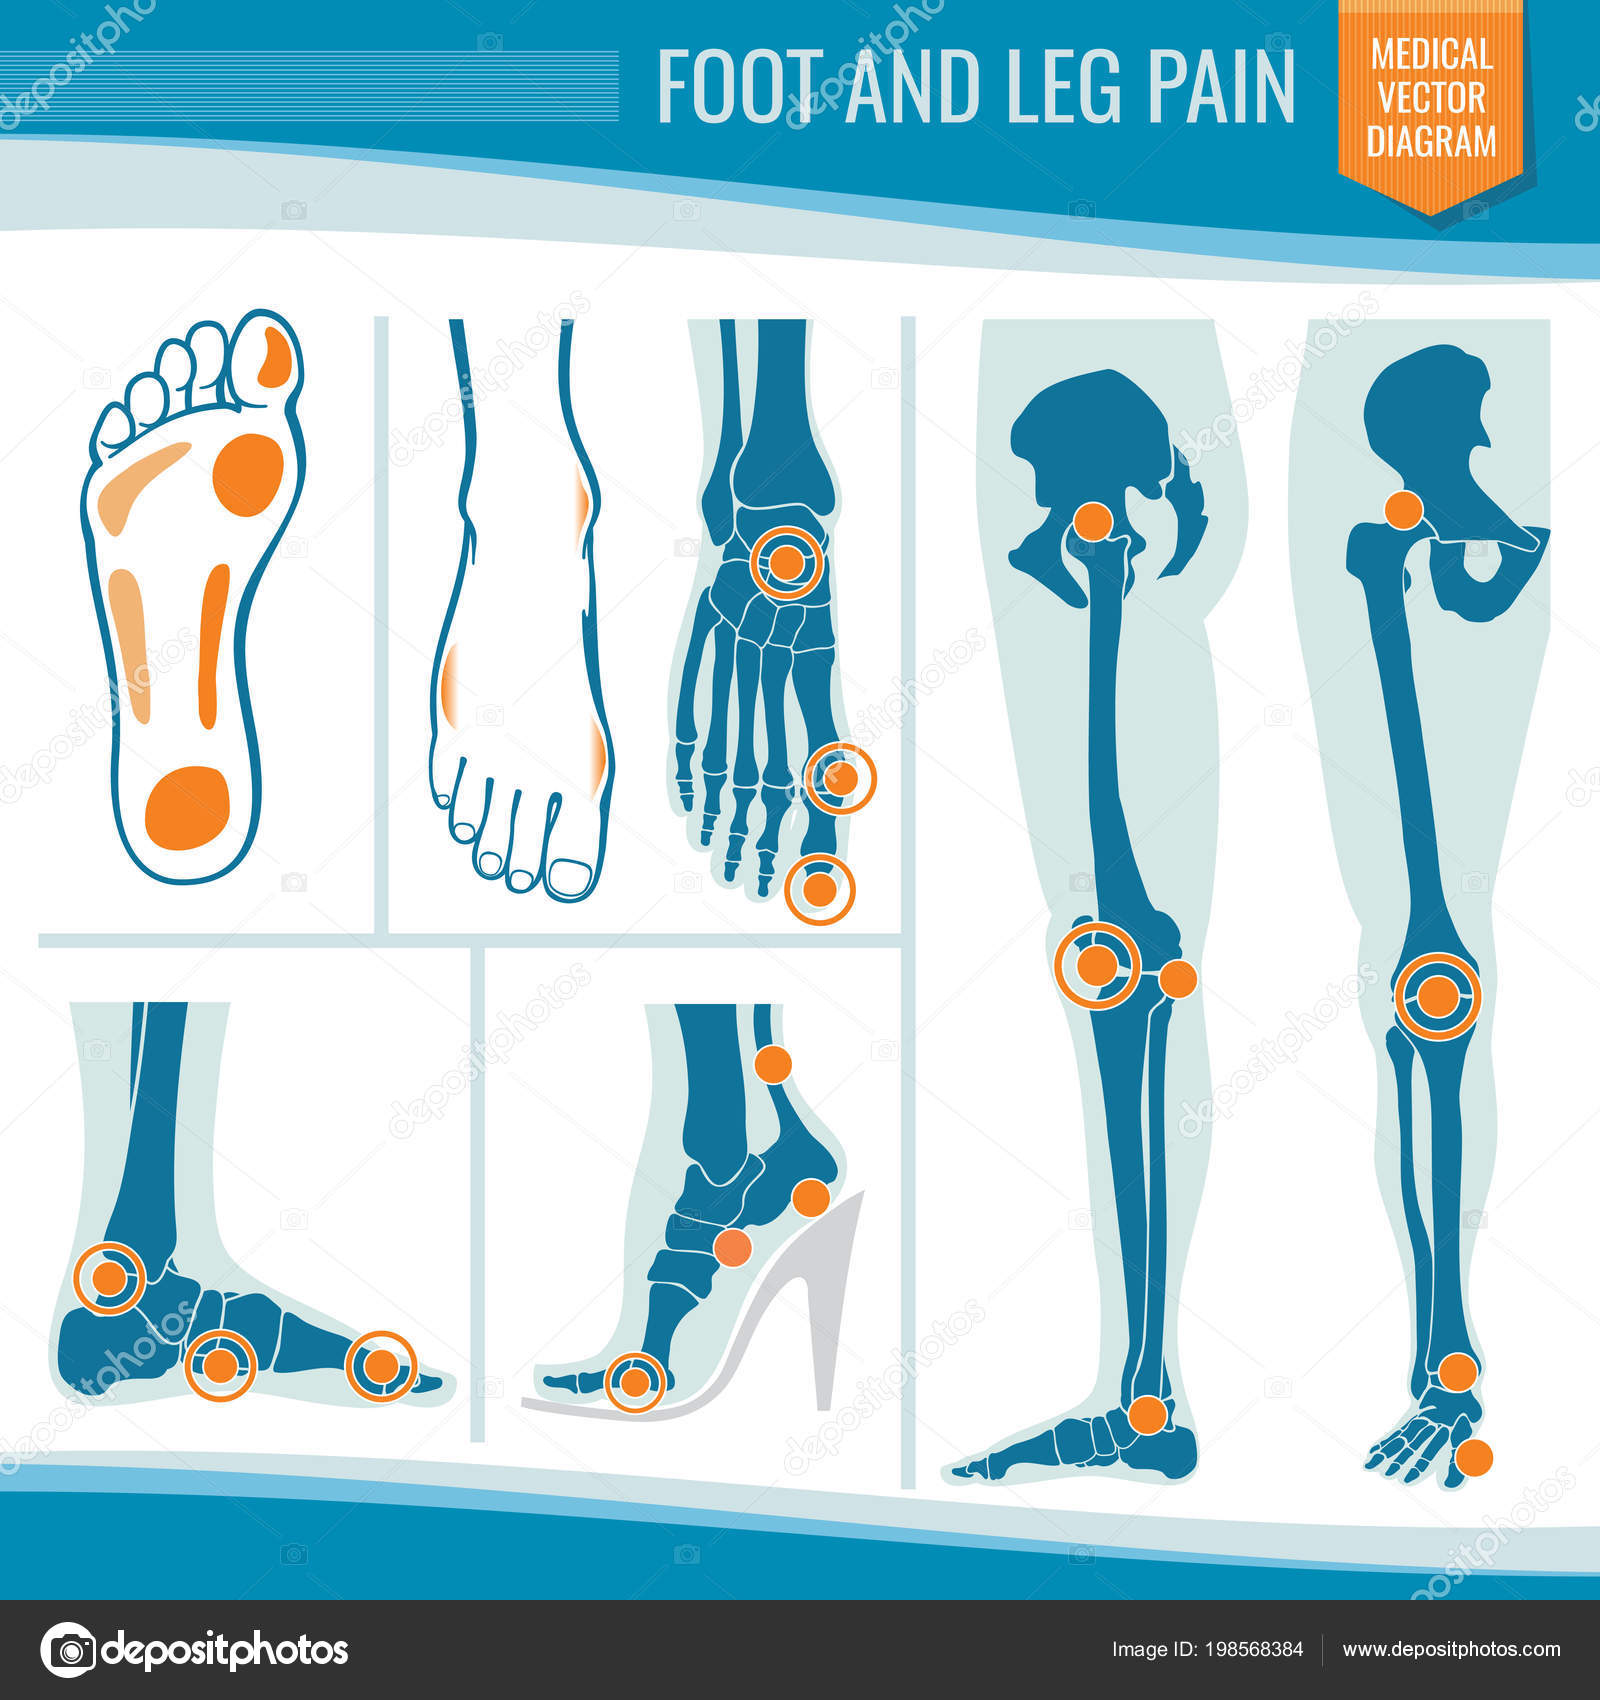 hight resolution of foot and leg pain arthritis and rheumatism orthopedic medical vector diagram stock vector